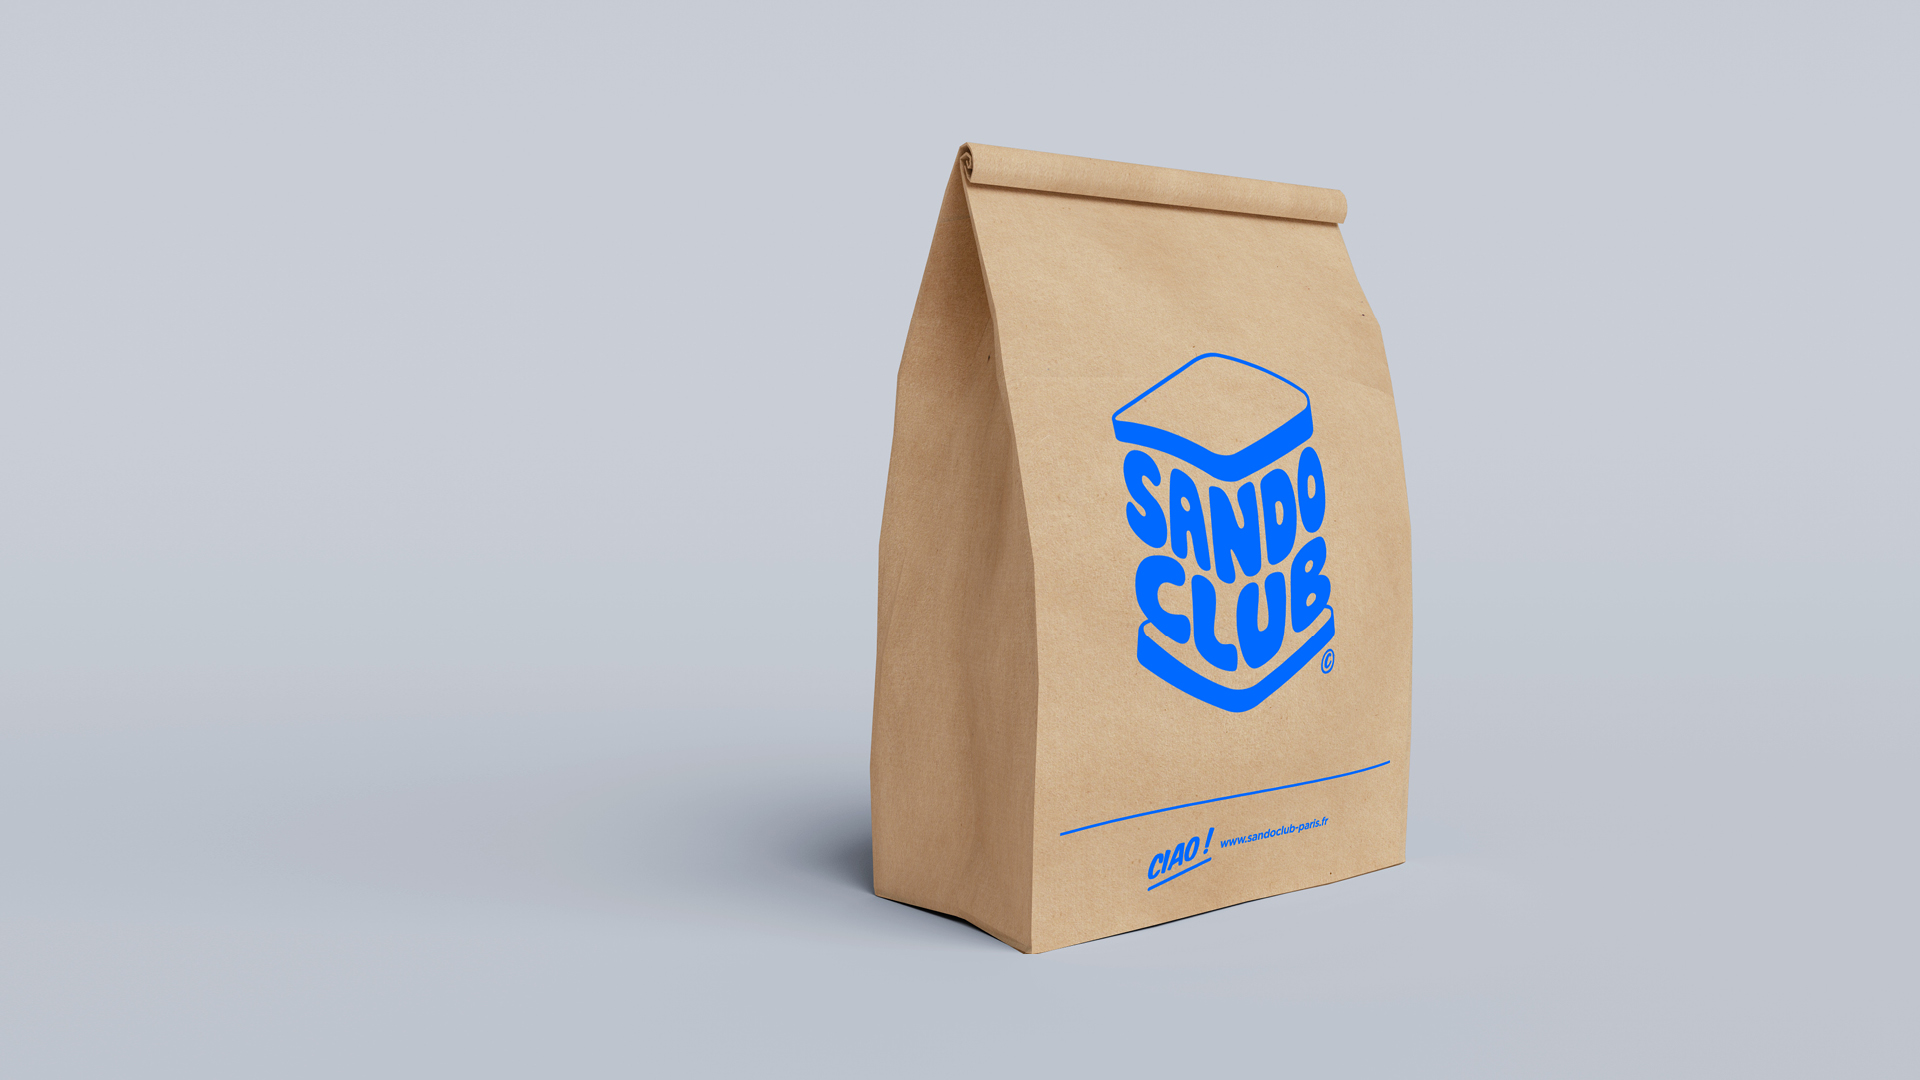 Sando Club